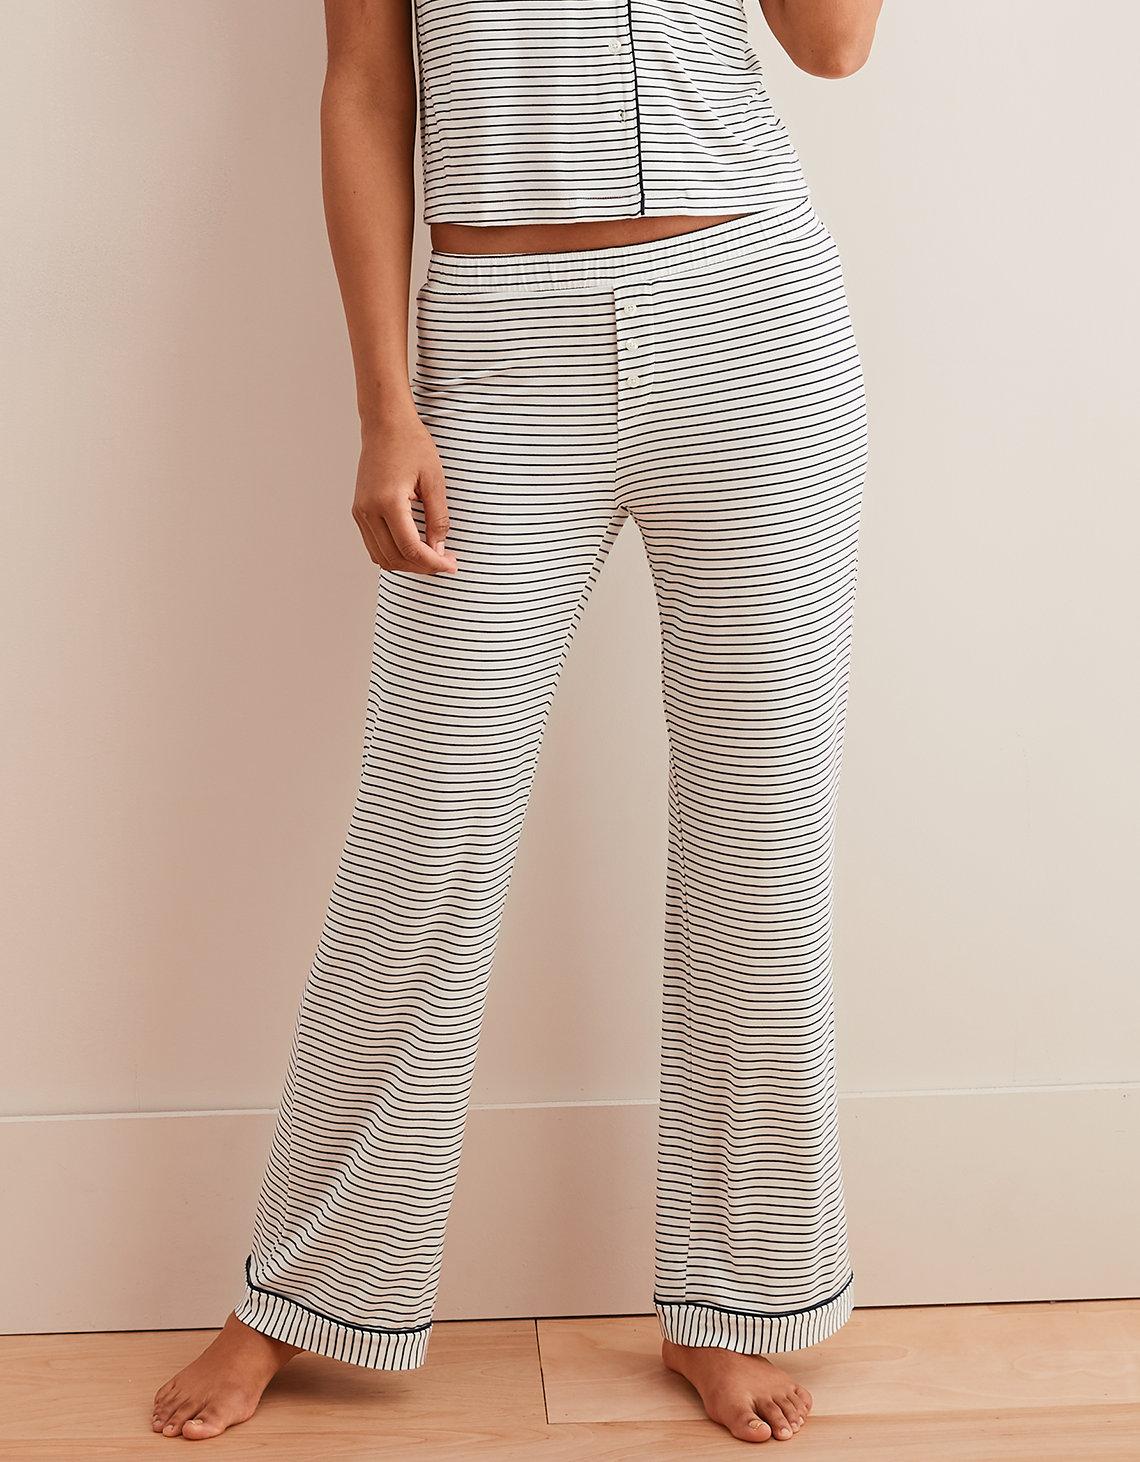 8c919c7292b1 Aerie Real Soft® Pajama Pant